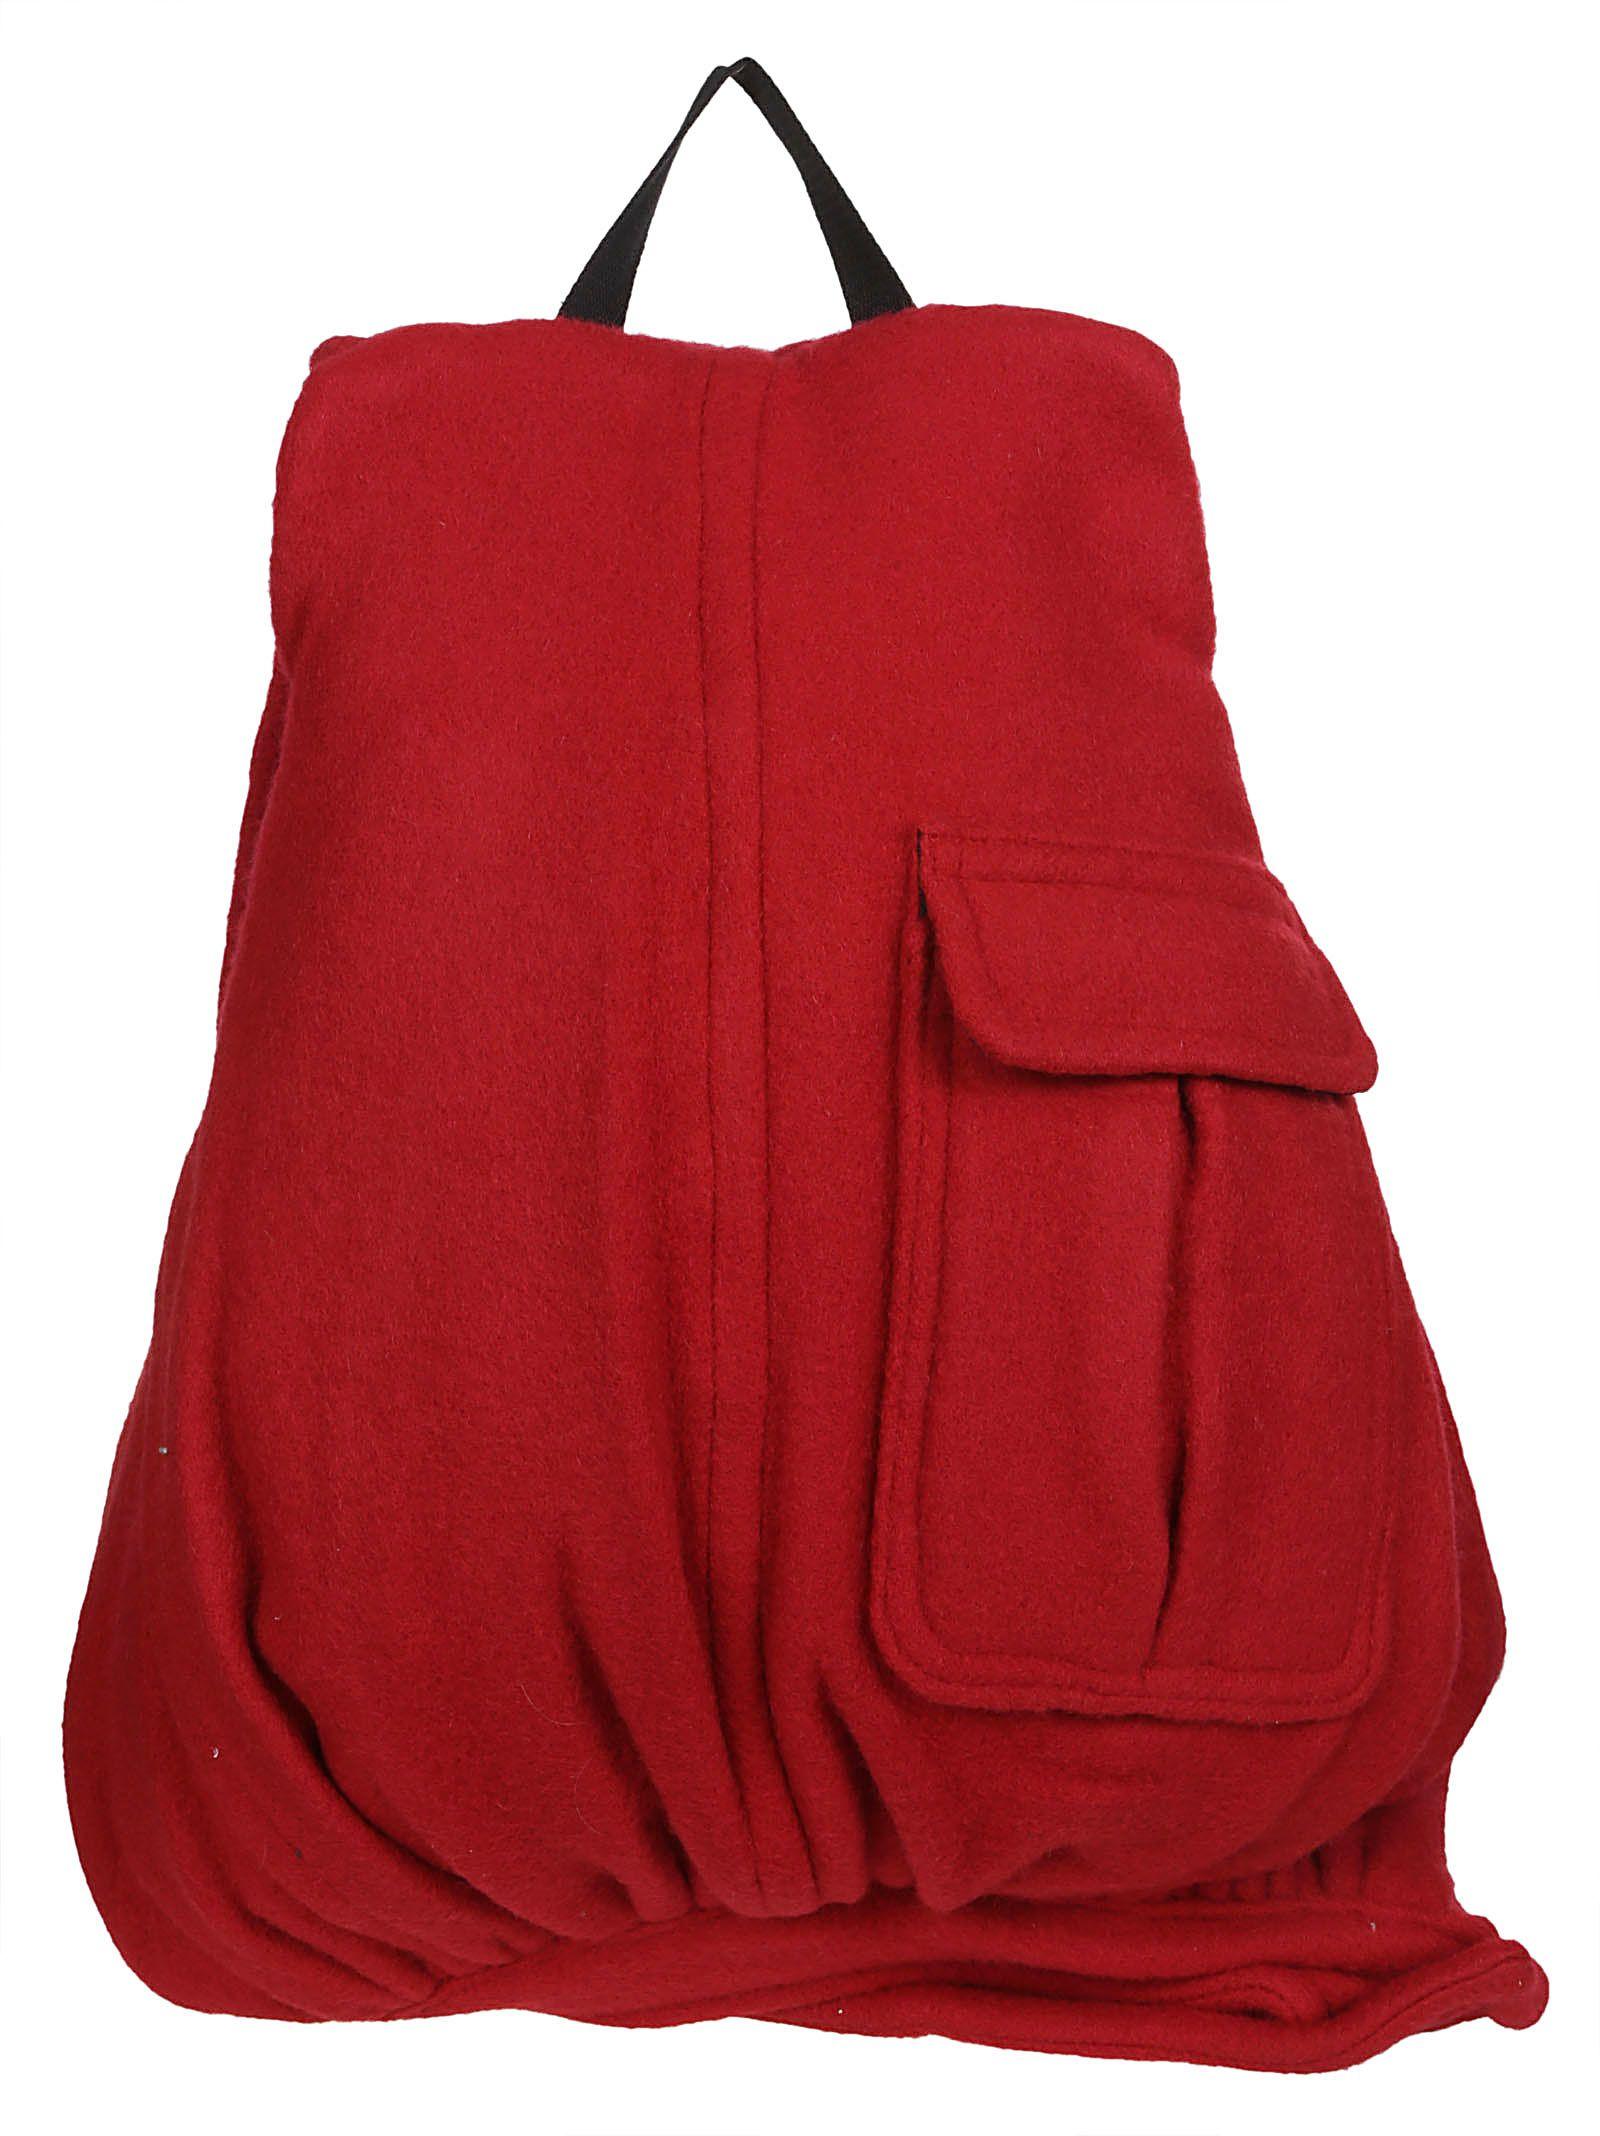 Eastpak Loose Wide Backpack W - Red